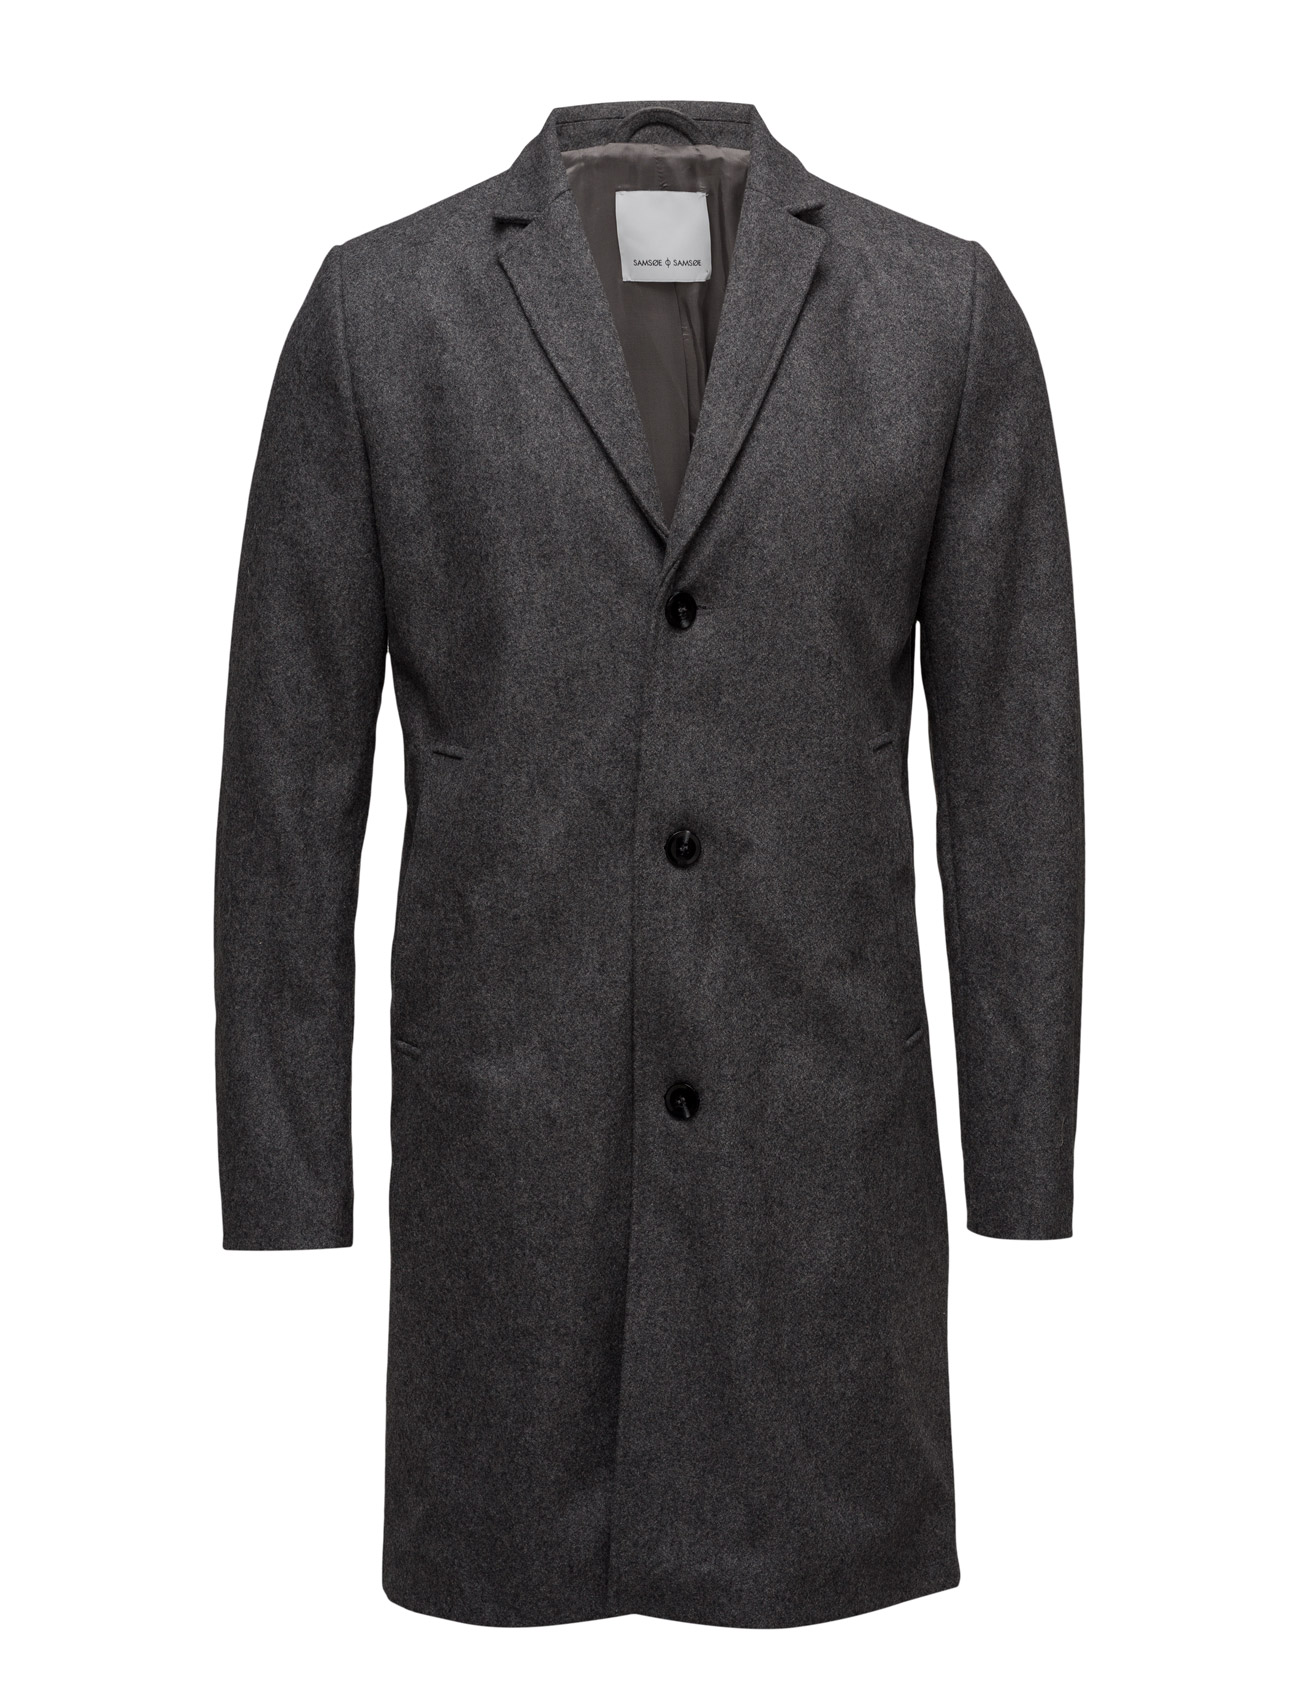 Gimir Jacket 5610 Samsøe & Samsøe Coats